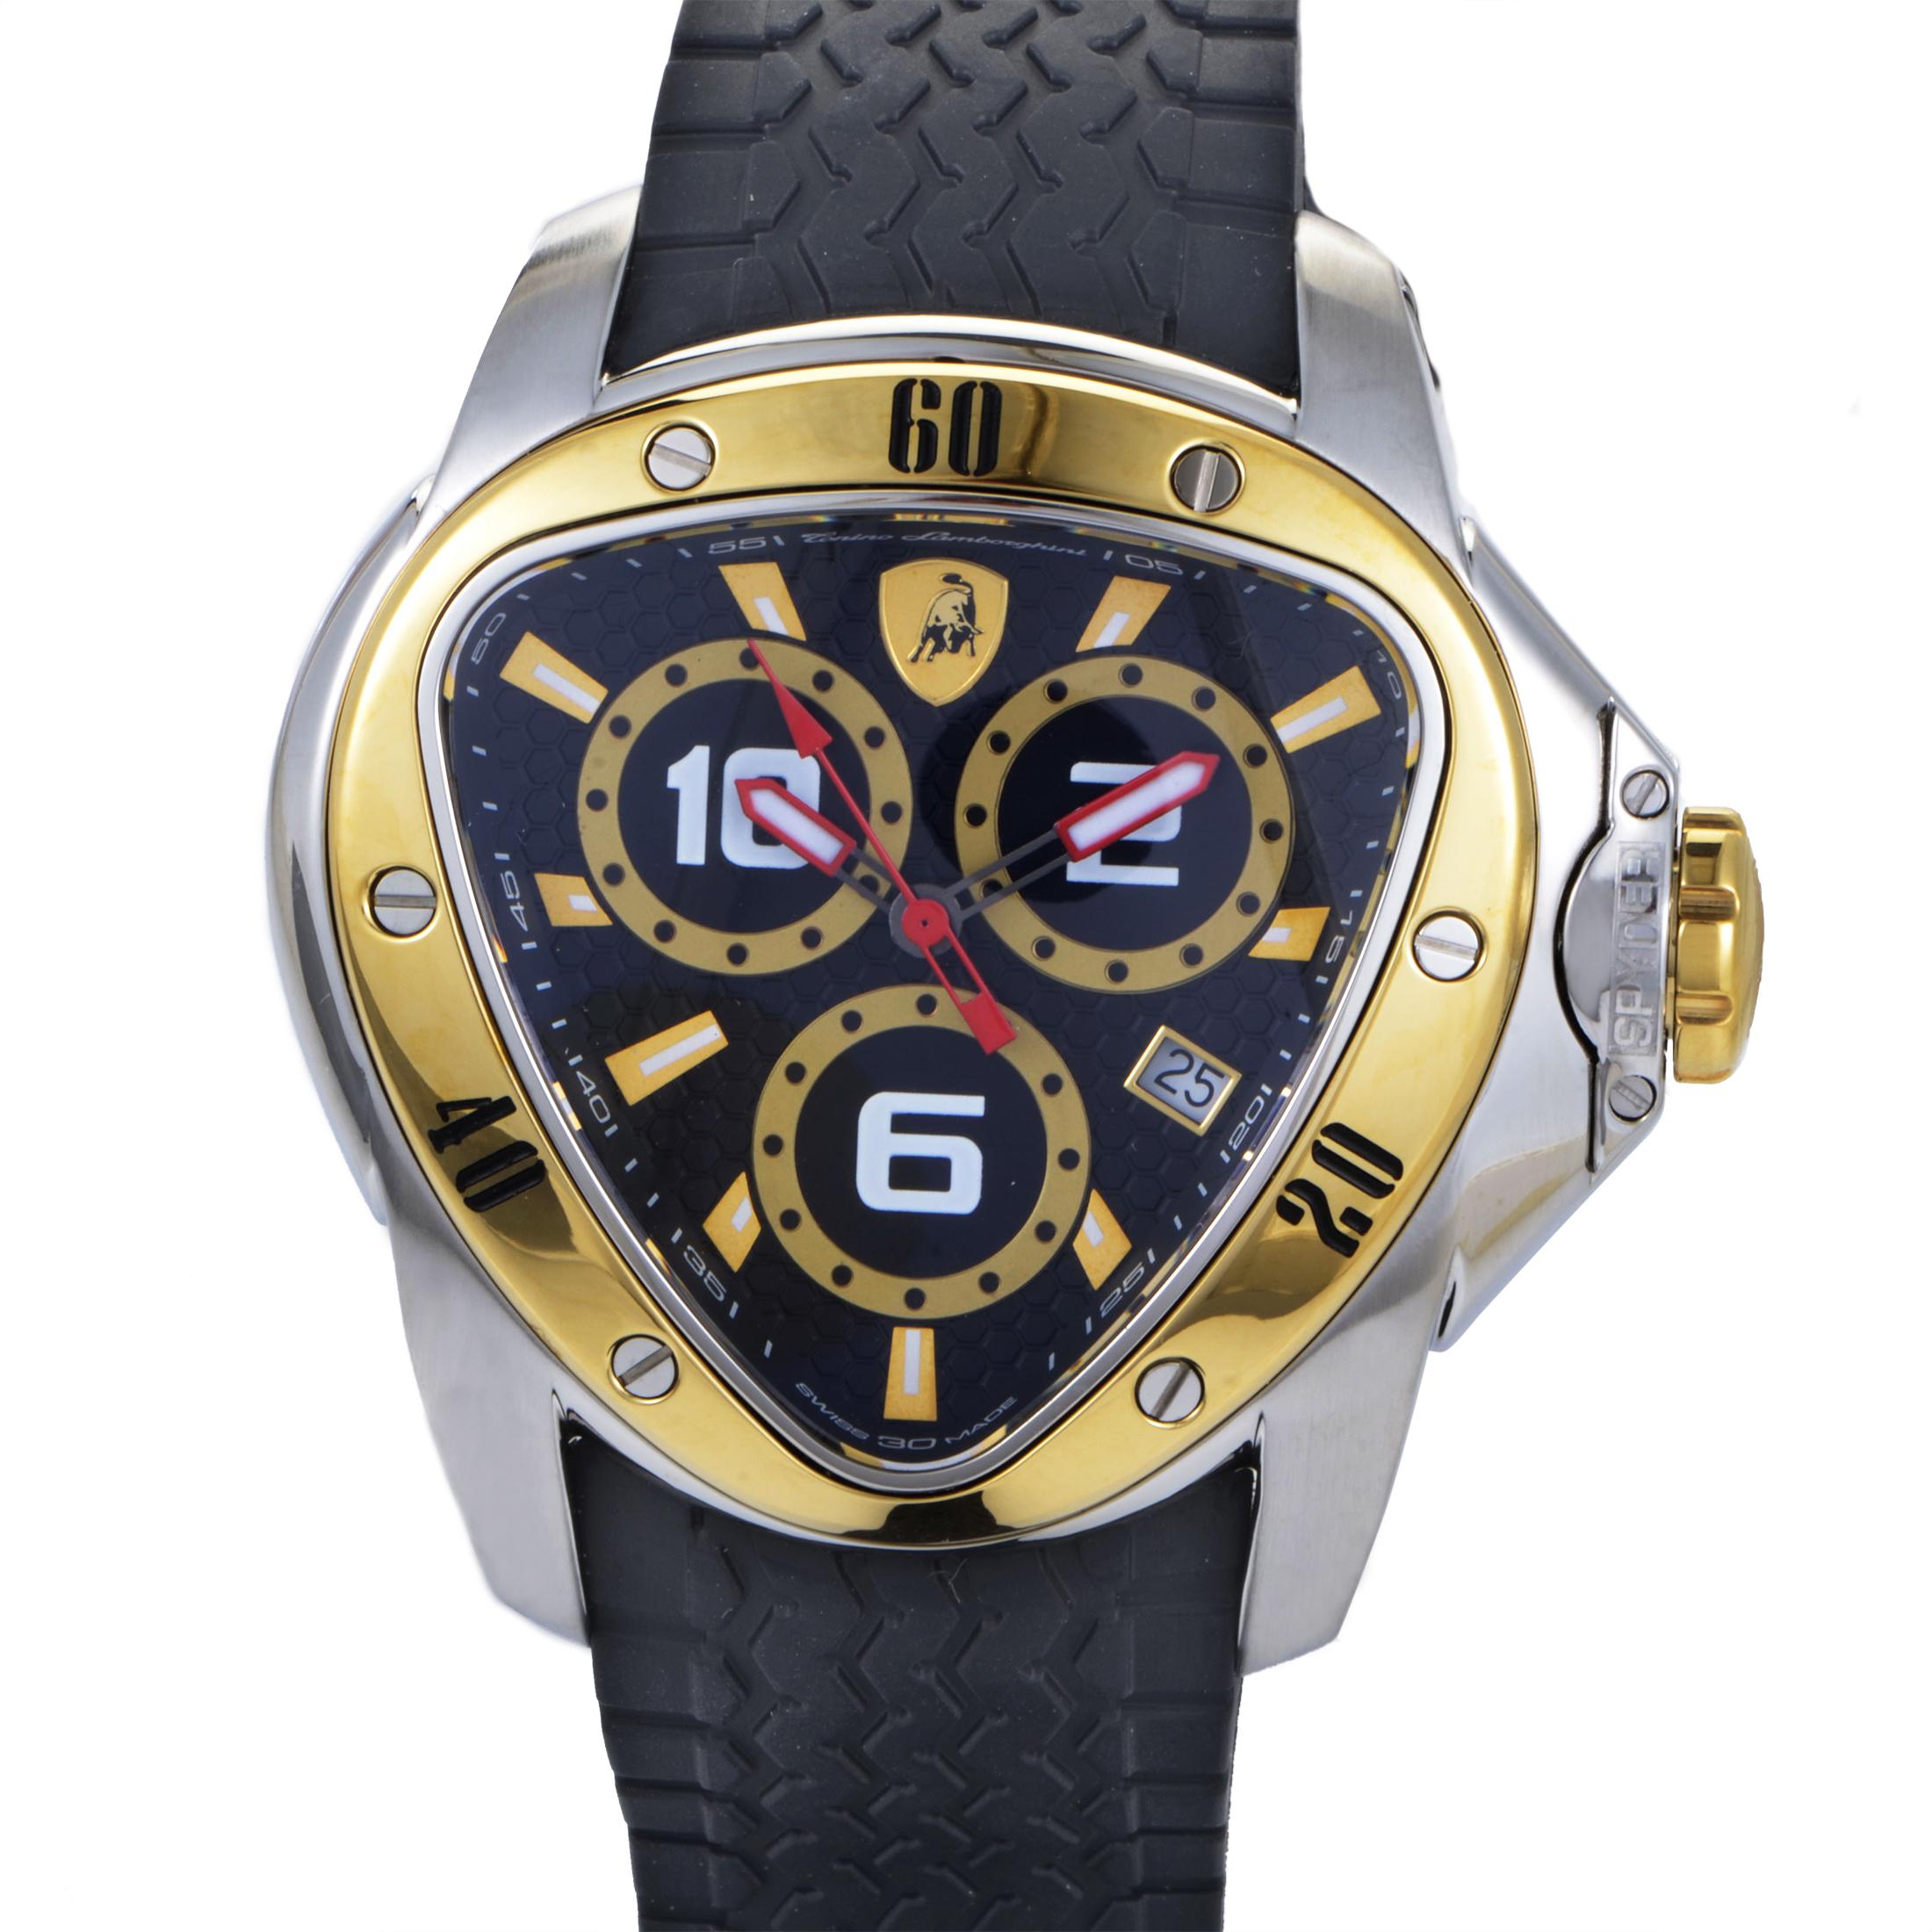 Spyder Men's Quartz Watch 1300 1306